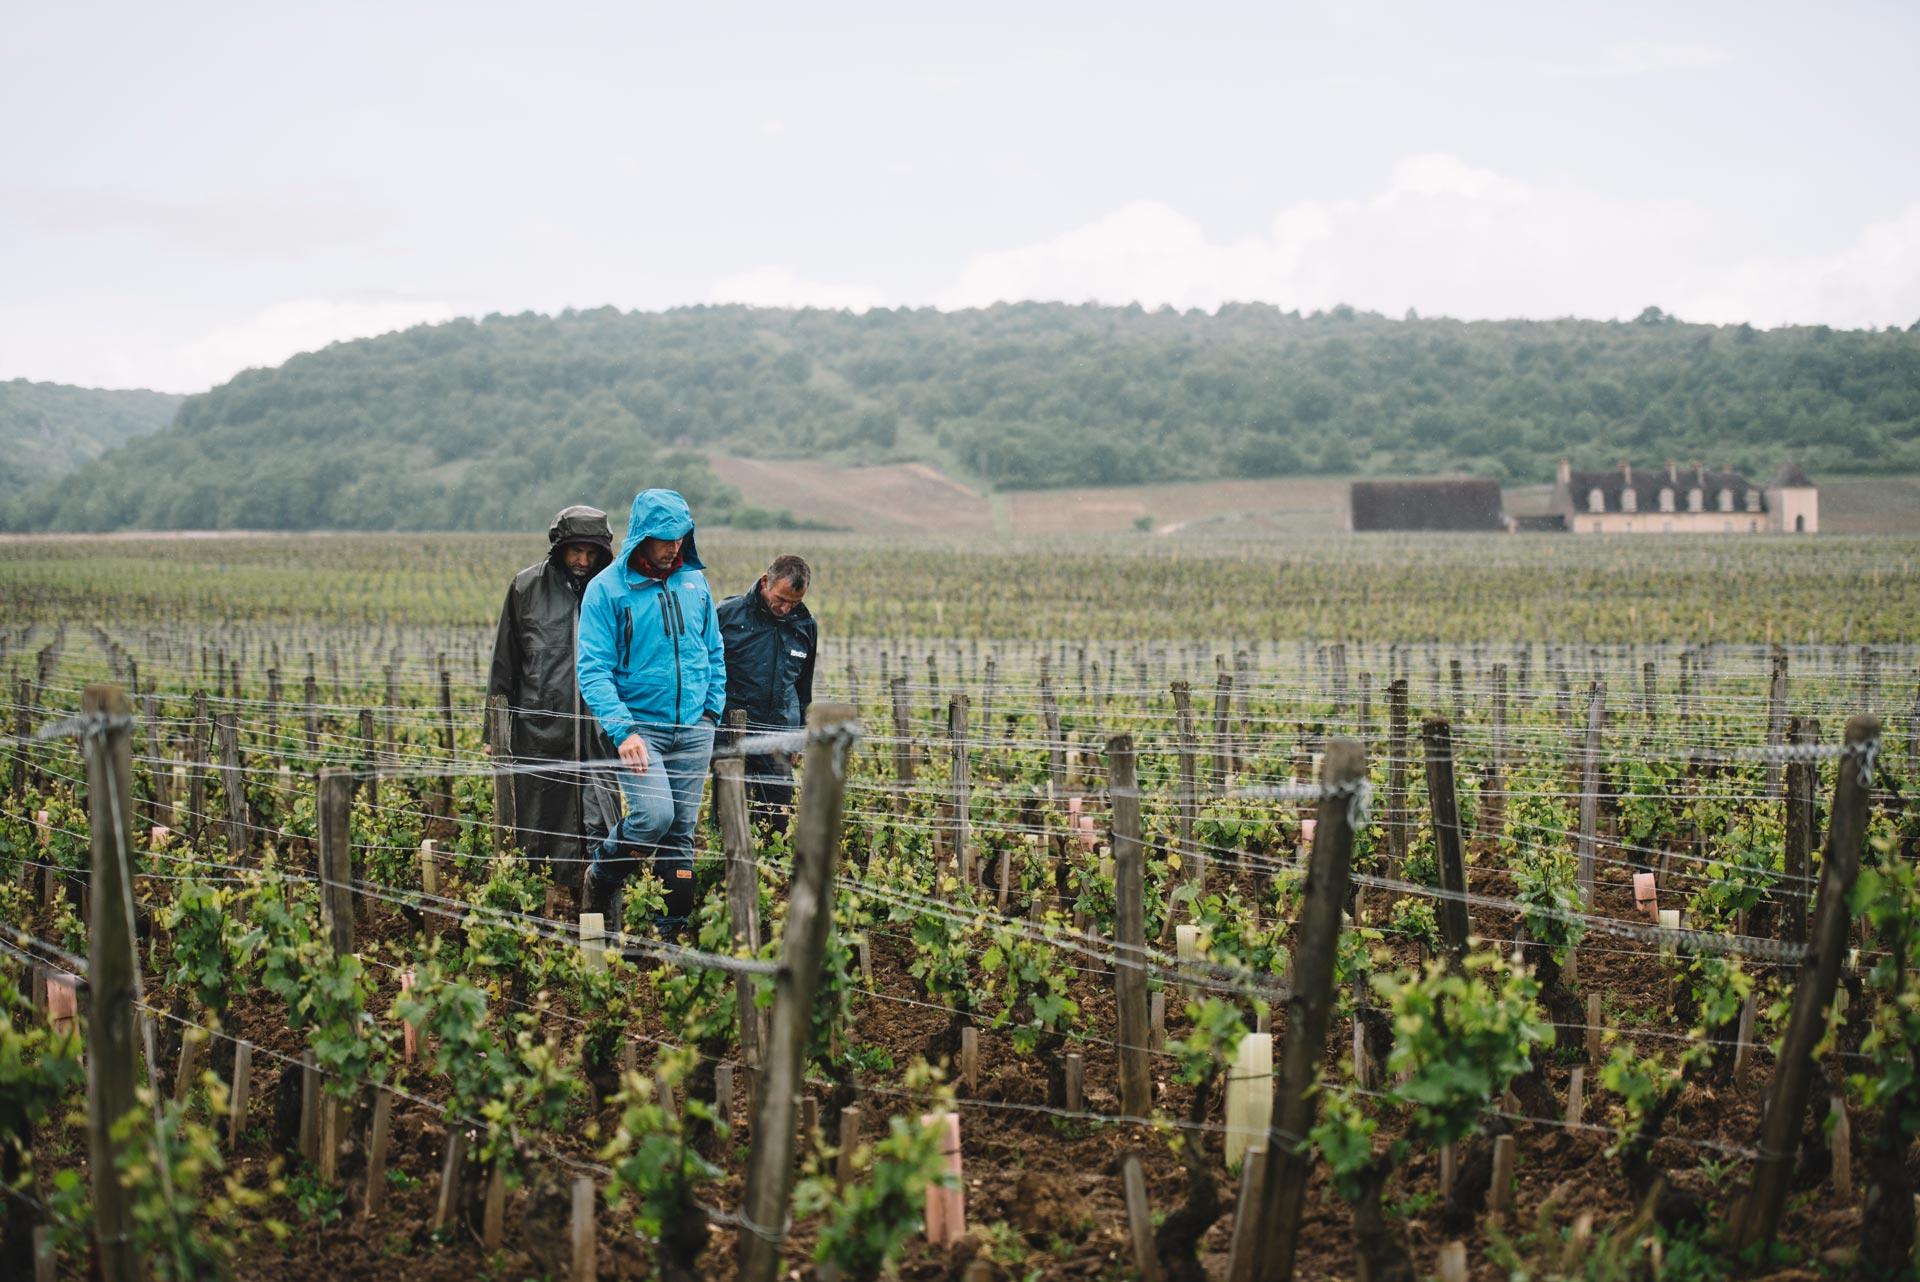 Tutoraggio in vigna   Domaine Leroy   Clos de Vougeot   Bourgogne